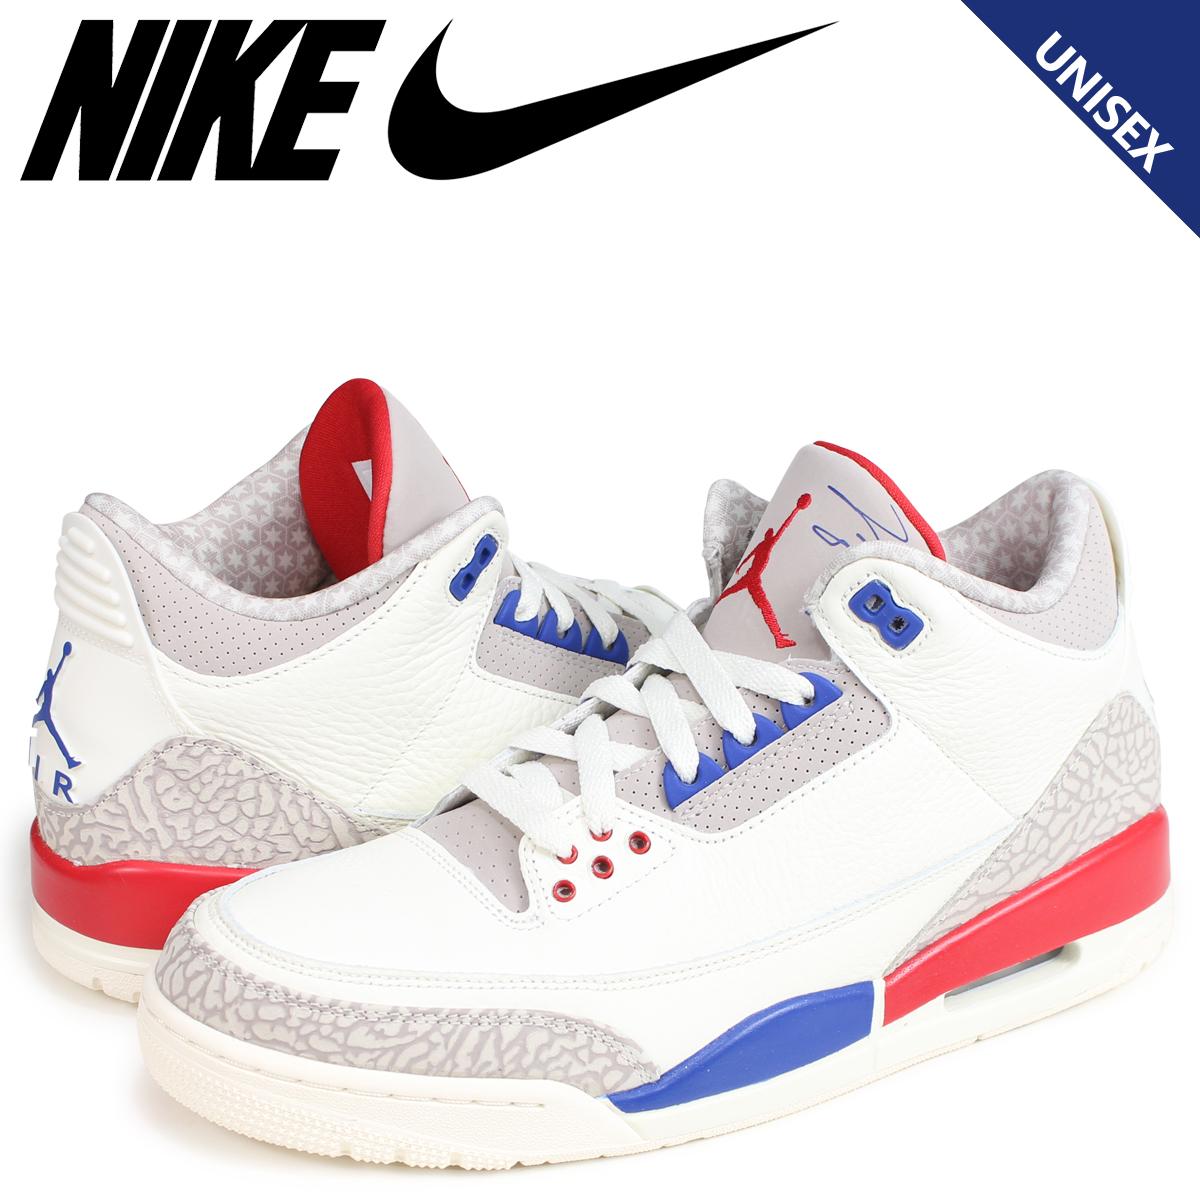 209be48e1eb1ee NIKE AIR JORDAN 3 RETRO Nike Air Jordan 3 sneakers nostalgic men white  36